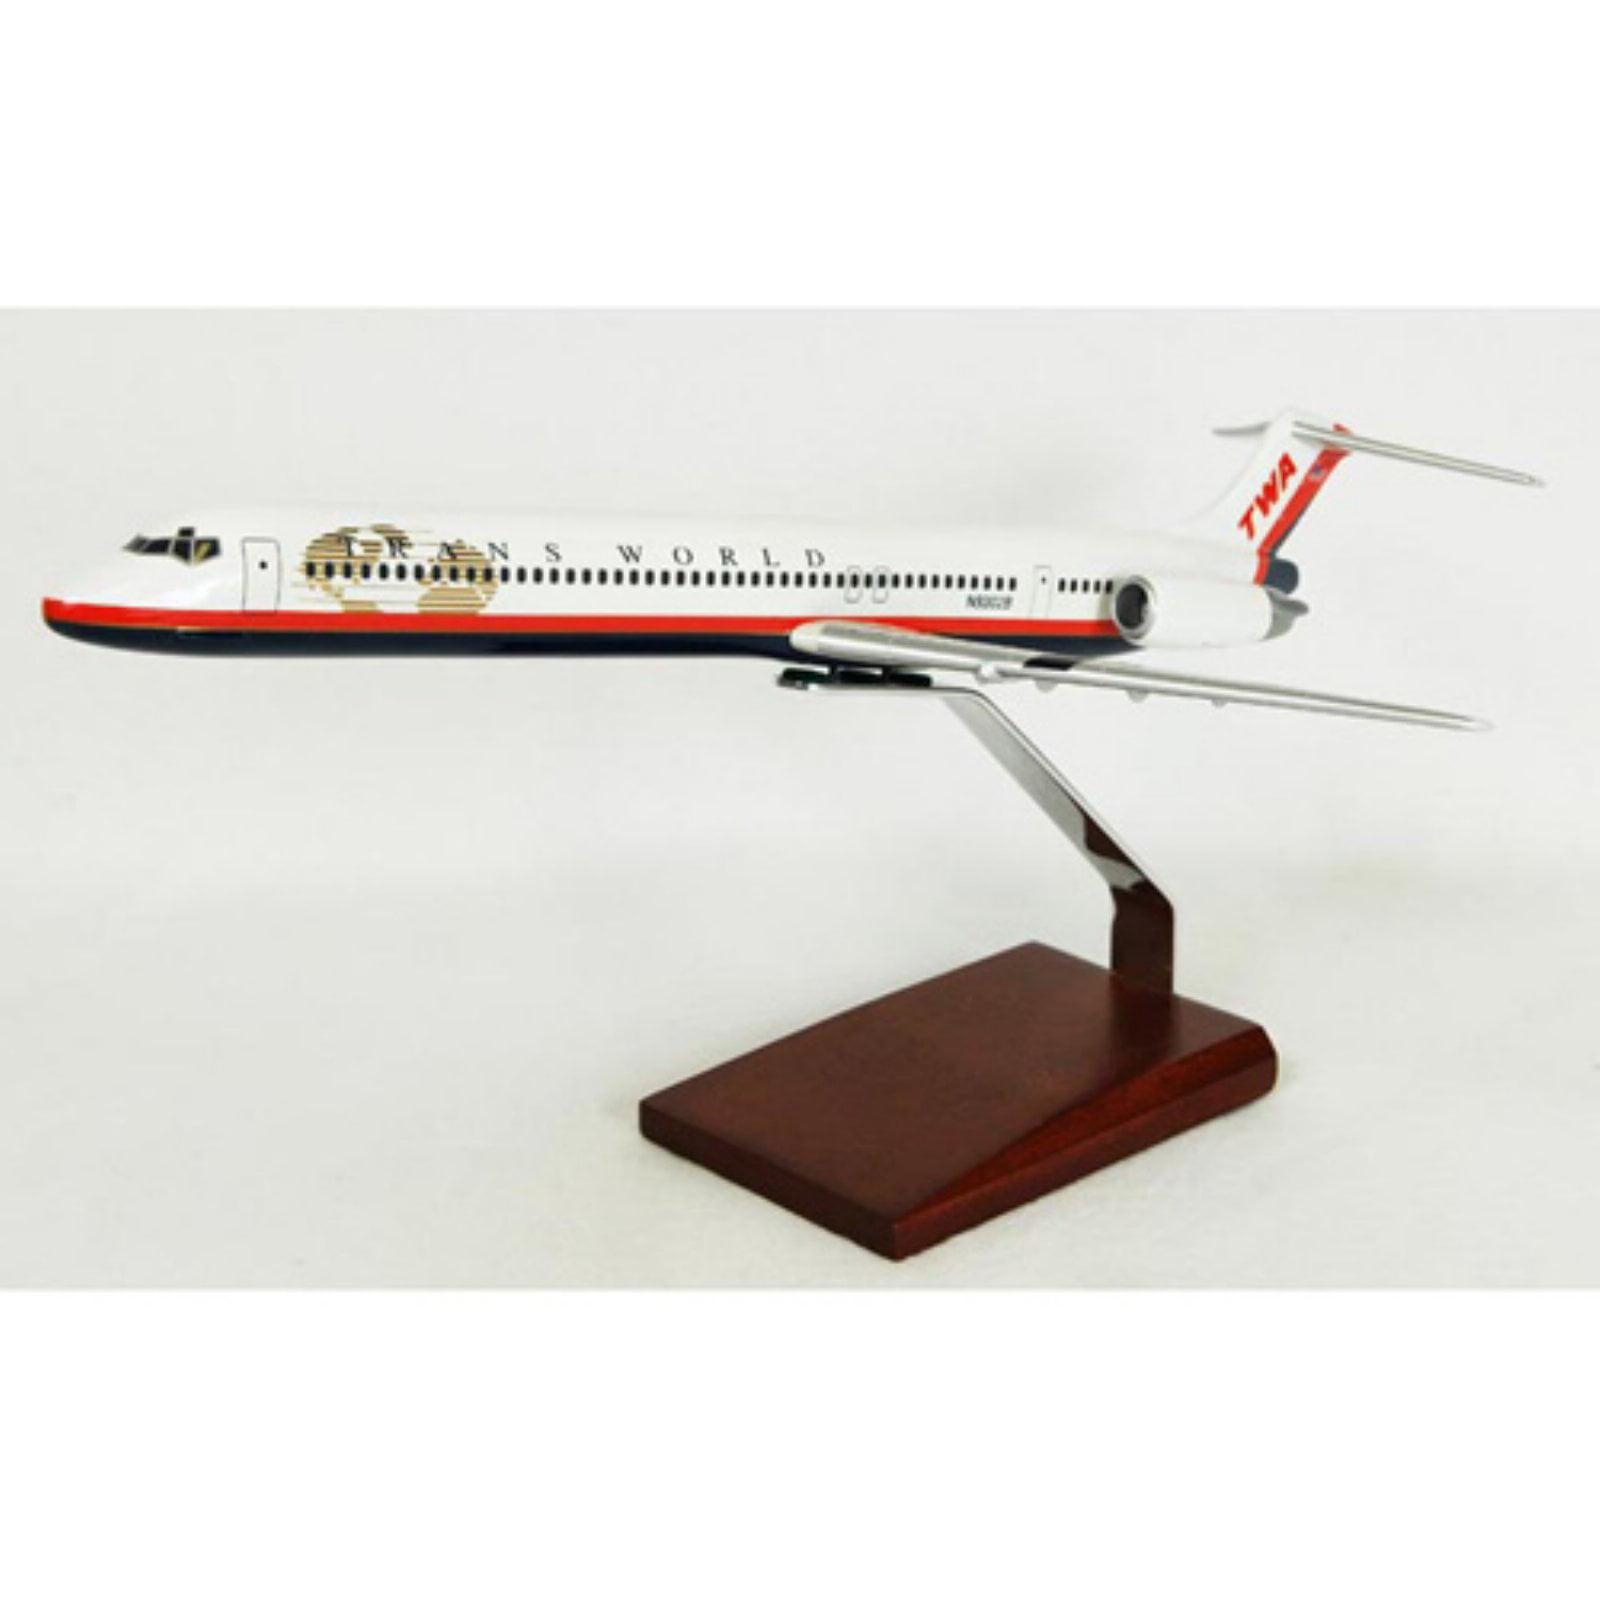 Daron Worldwide McDonnell Douglas MD-80 TWA Model Airplane by DARON